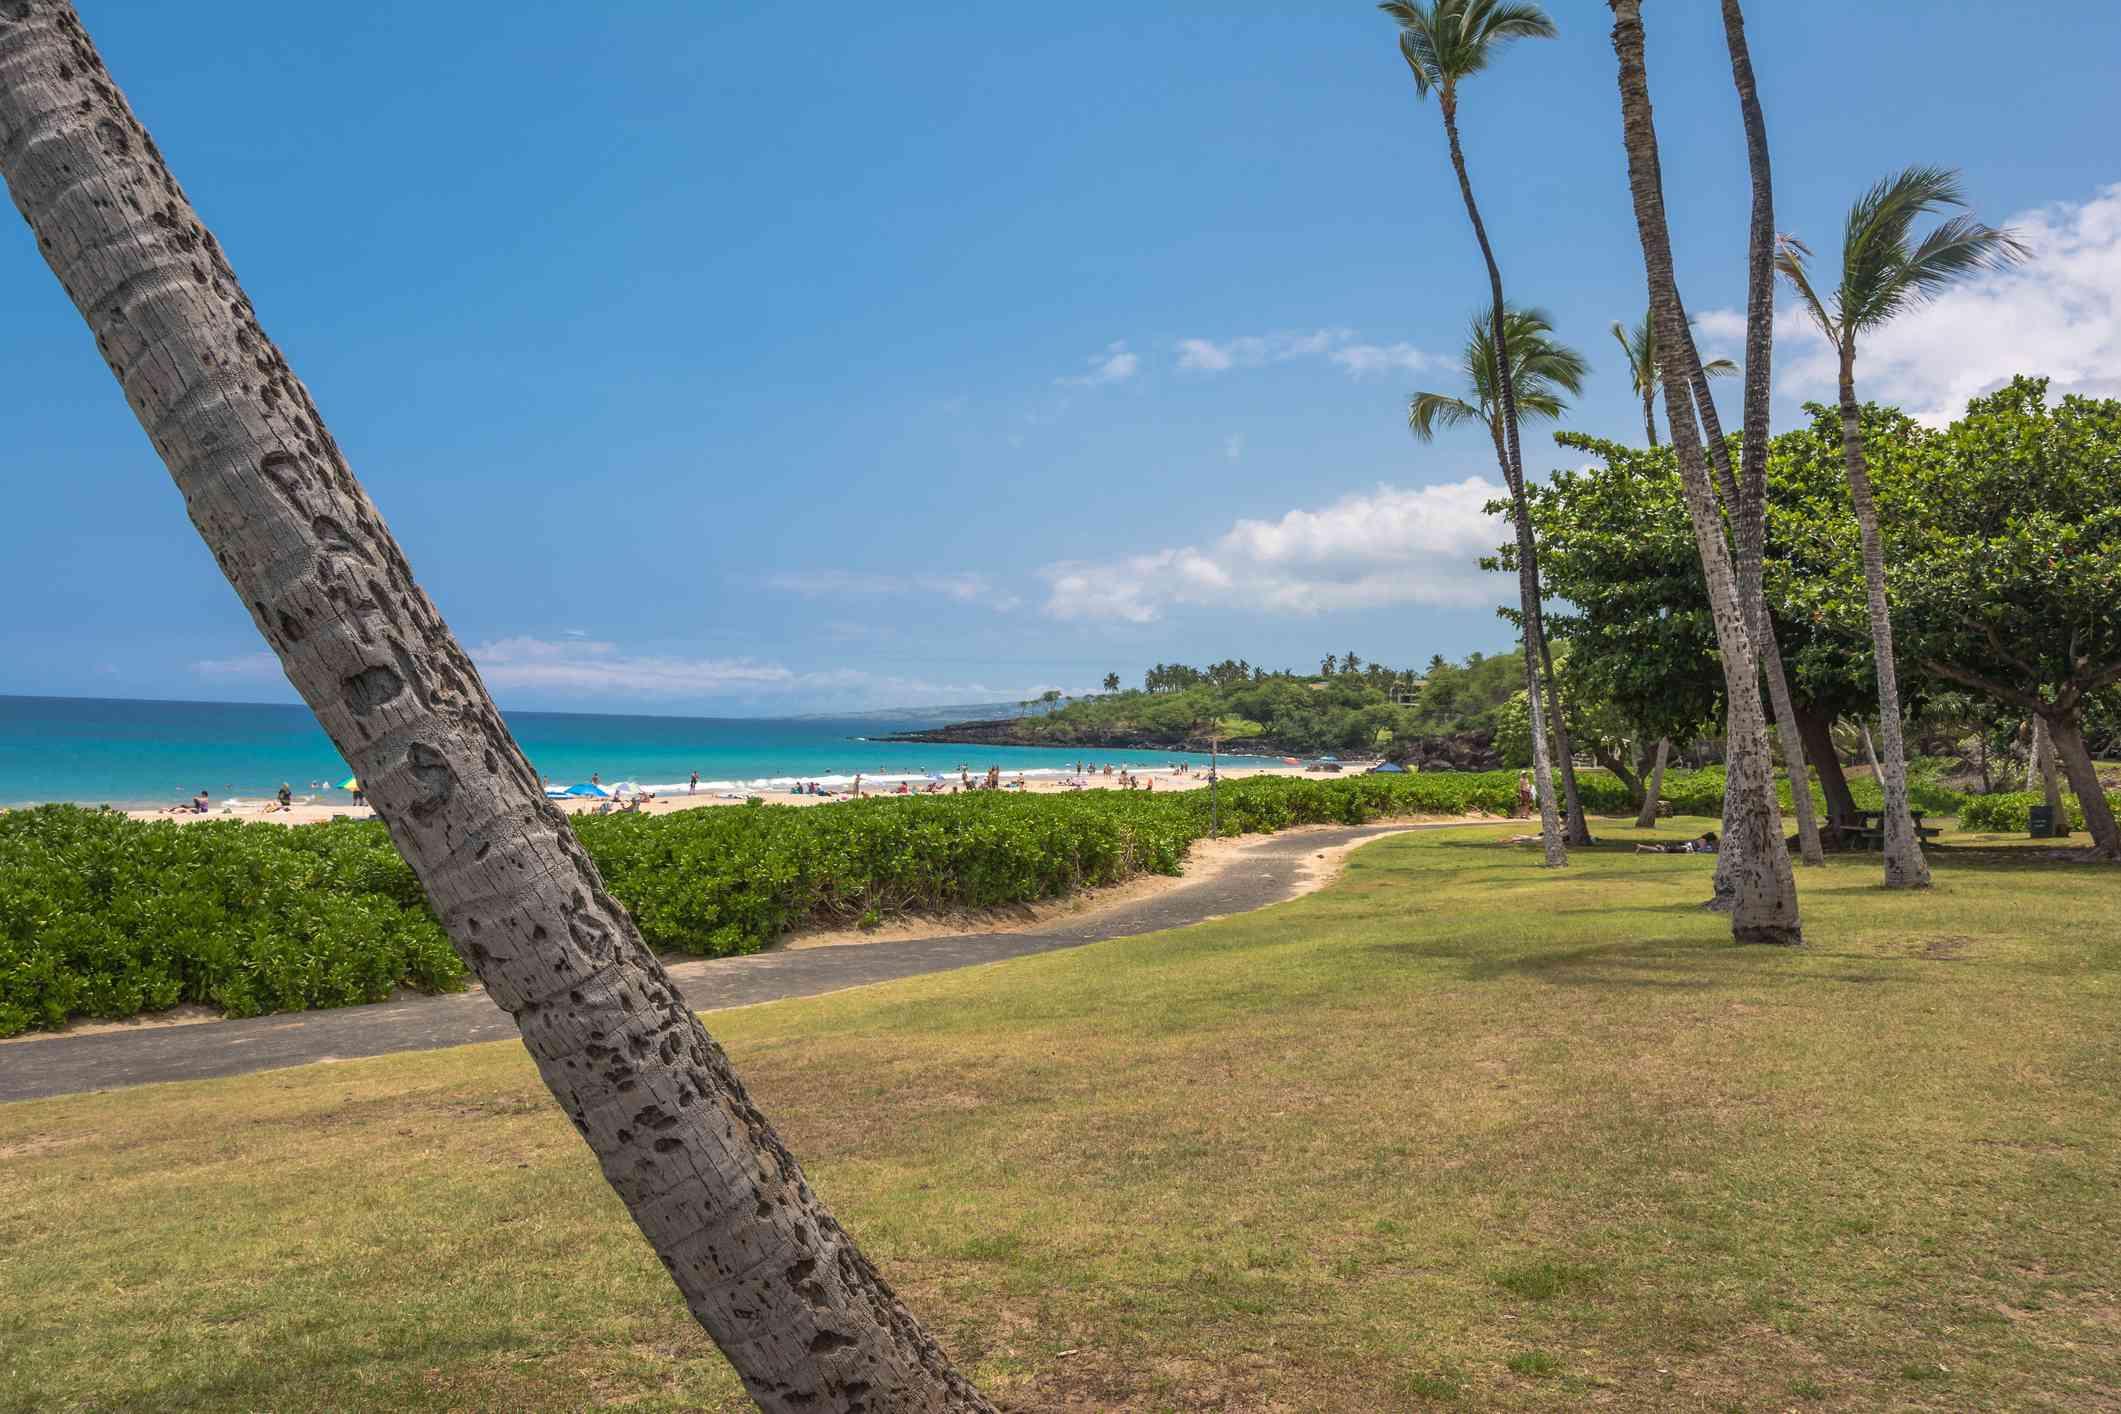 Hāpuna Beach State Park on Big Island, Hawaii